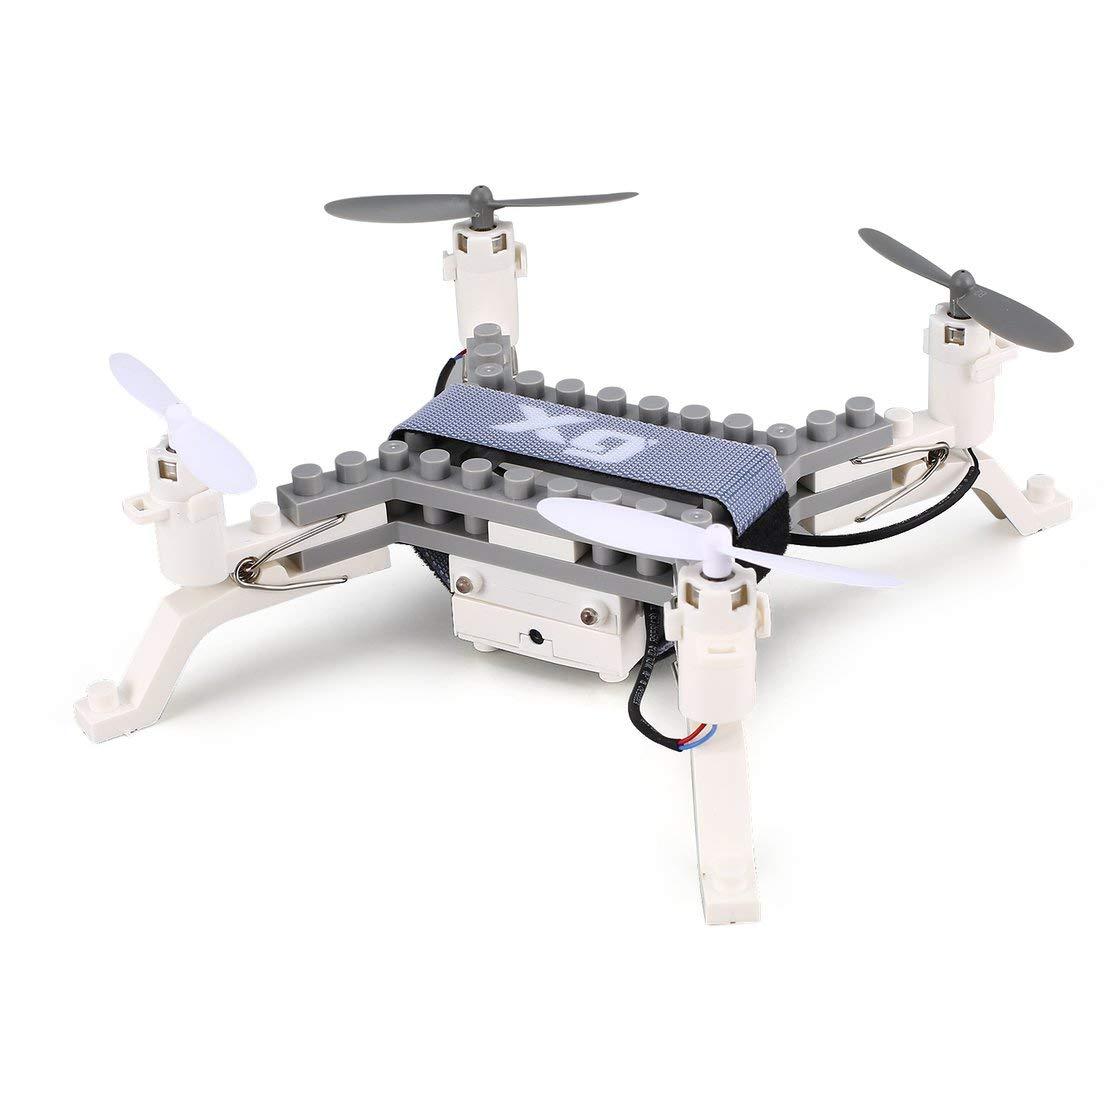 XG171 Smart RC 2.4G RC Baustein 3D Ziegel FPV Quadcopter Drohne Flugzeug mit Kamera Höhenstand Headless Modus 3D Flips